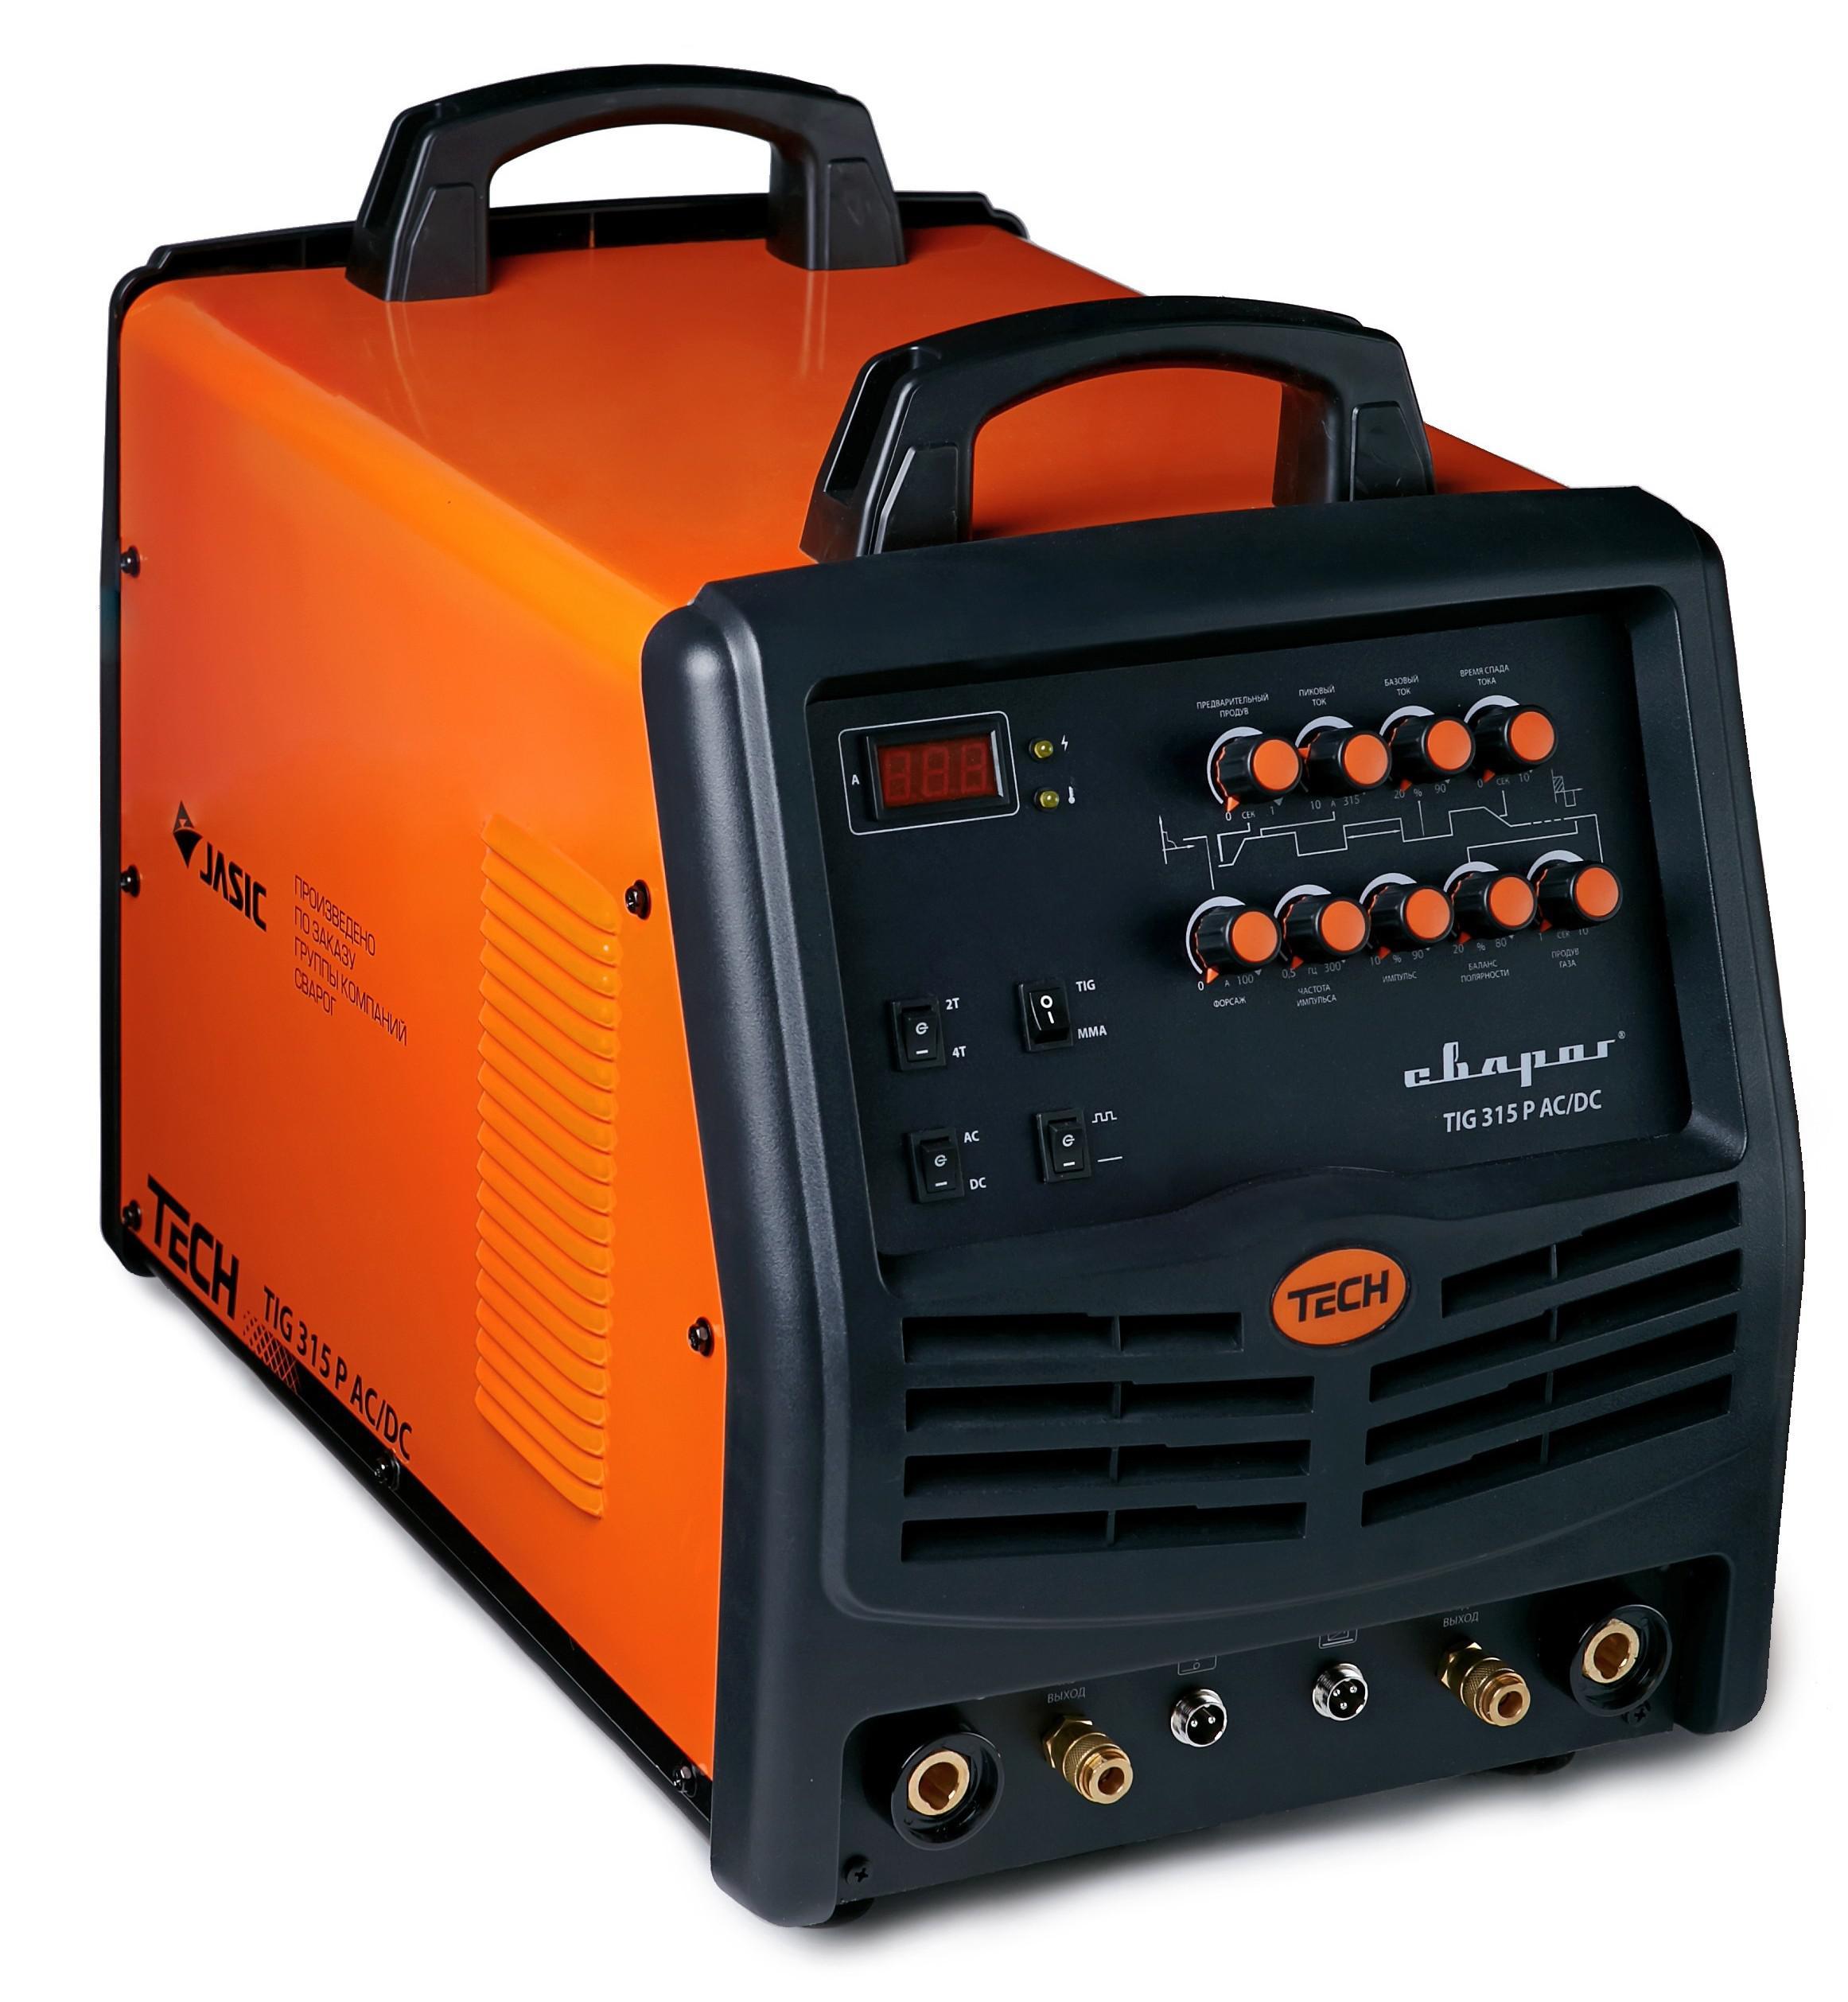 Сварочный аппарат СВАРОГ Tech tig 315 p ac/dc (e103) сварочный аппарат сварог pro tig 200 p dsp w212